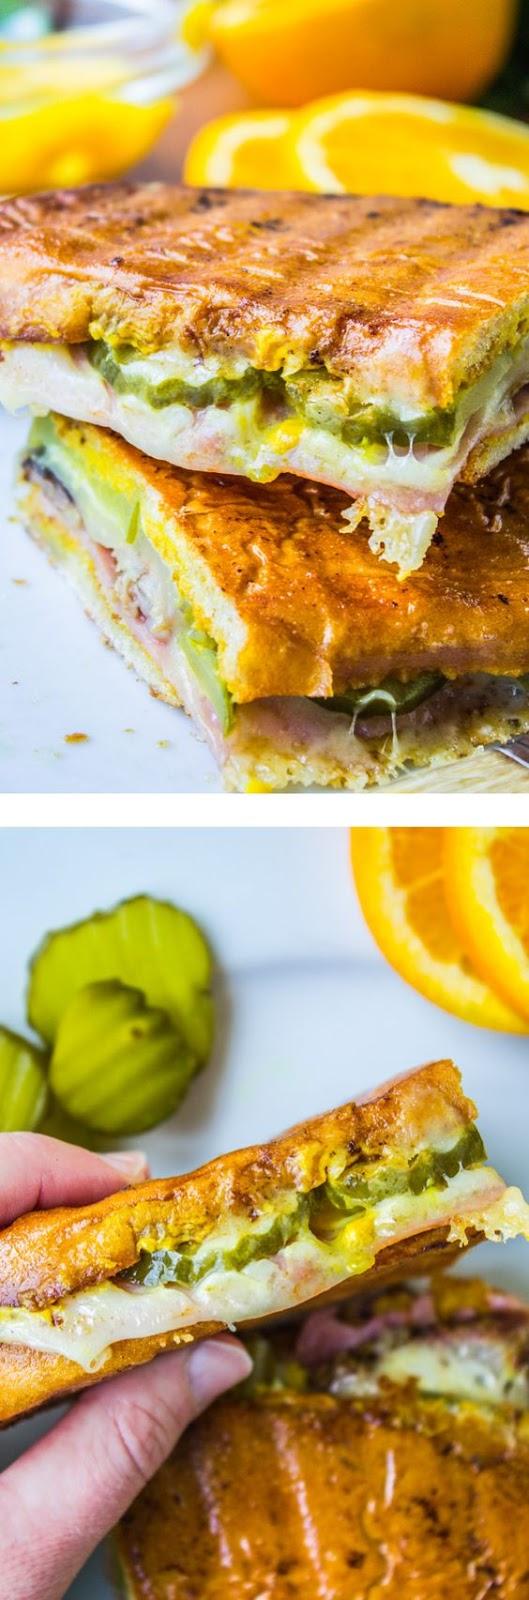 Cuban Sandwiches (Cubanos)